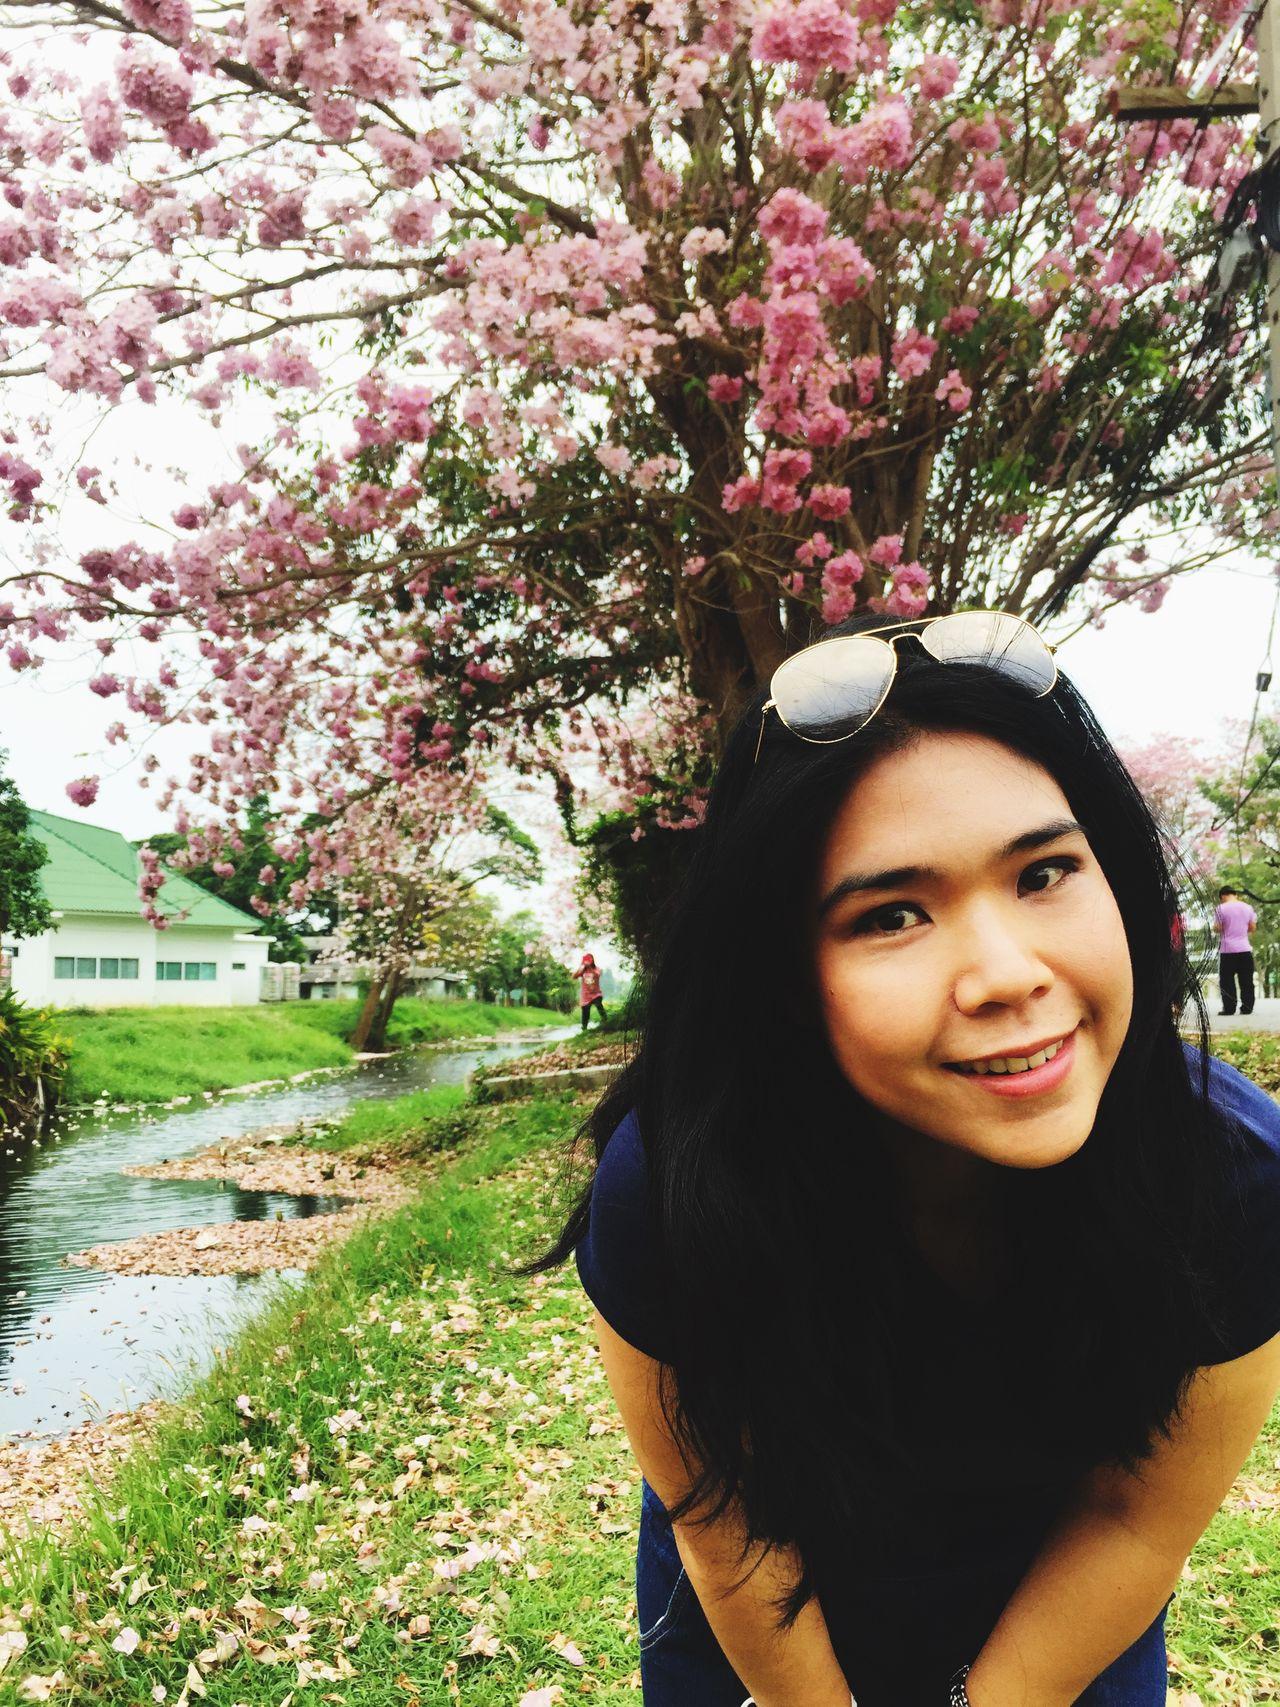 Sightseeing Myplants Enjoying Life AummySoCute Traveling Thailand Hello World